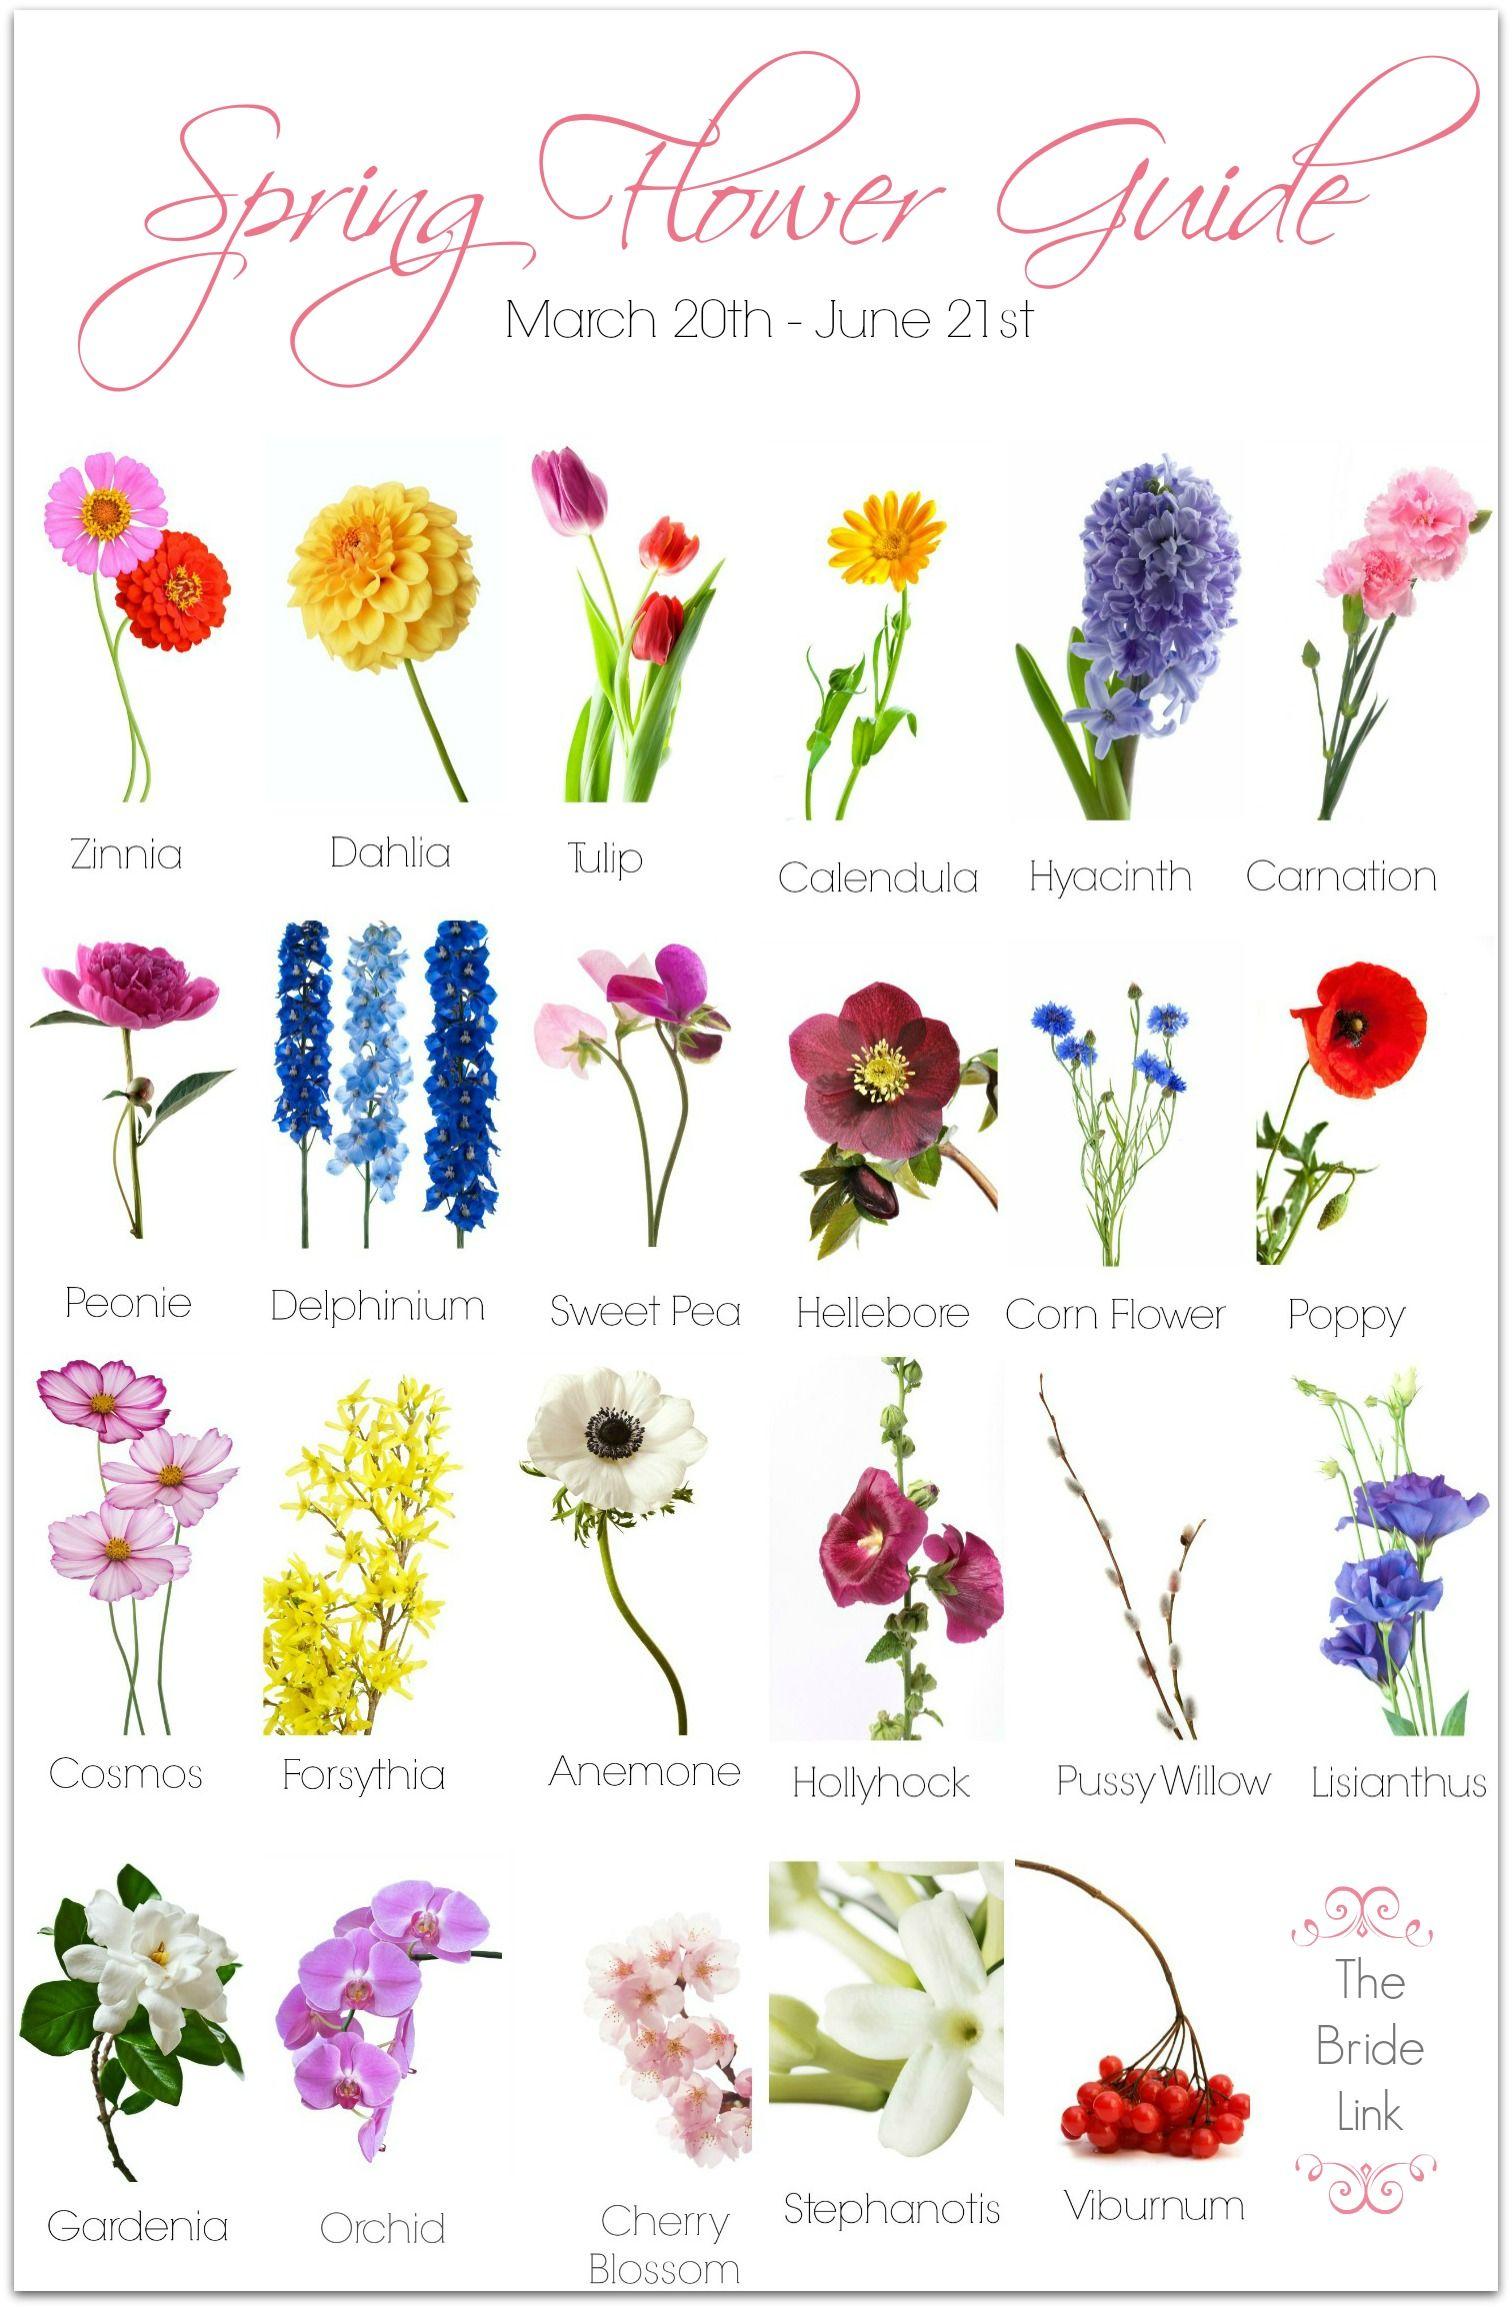 Spring Wedding Flower Guide Wedding flower guide, Spring